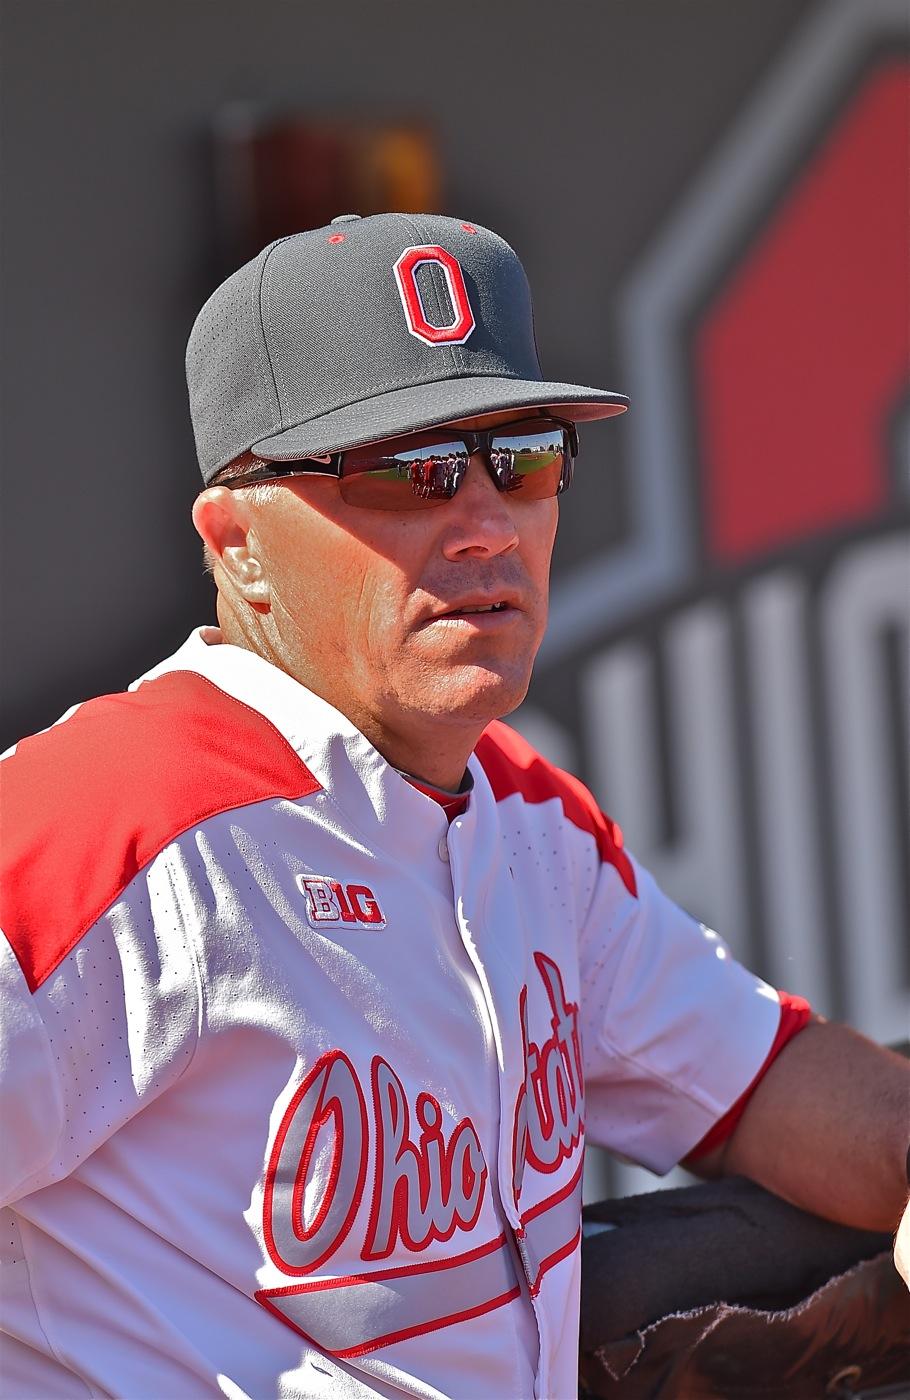 OSU Baseball: Beals Works Phone During Shutdown